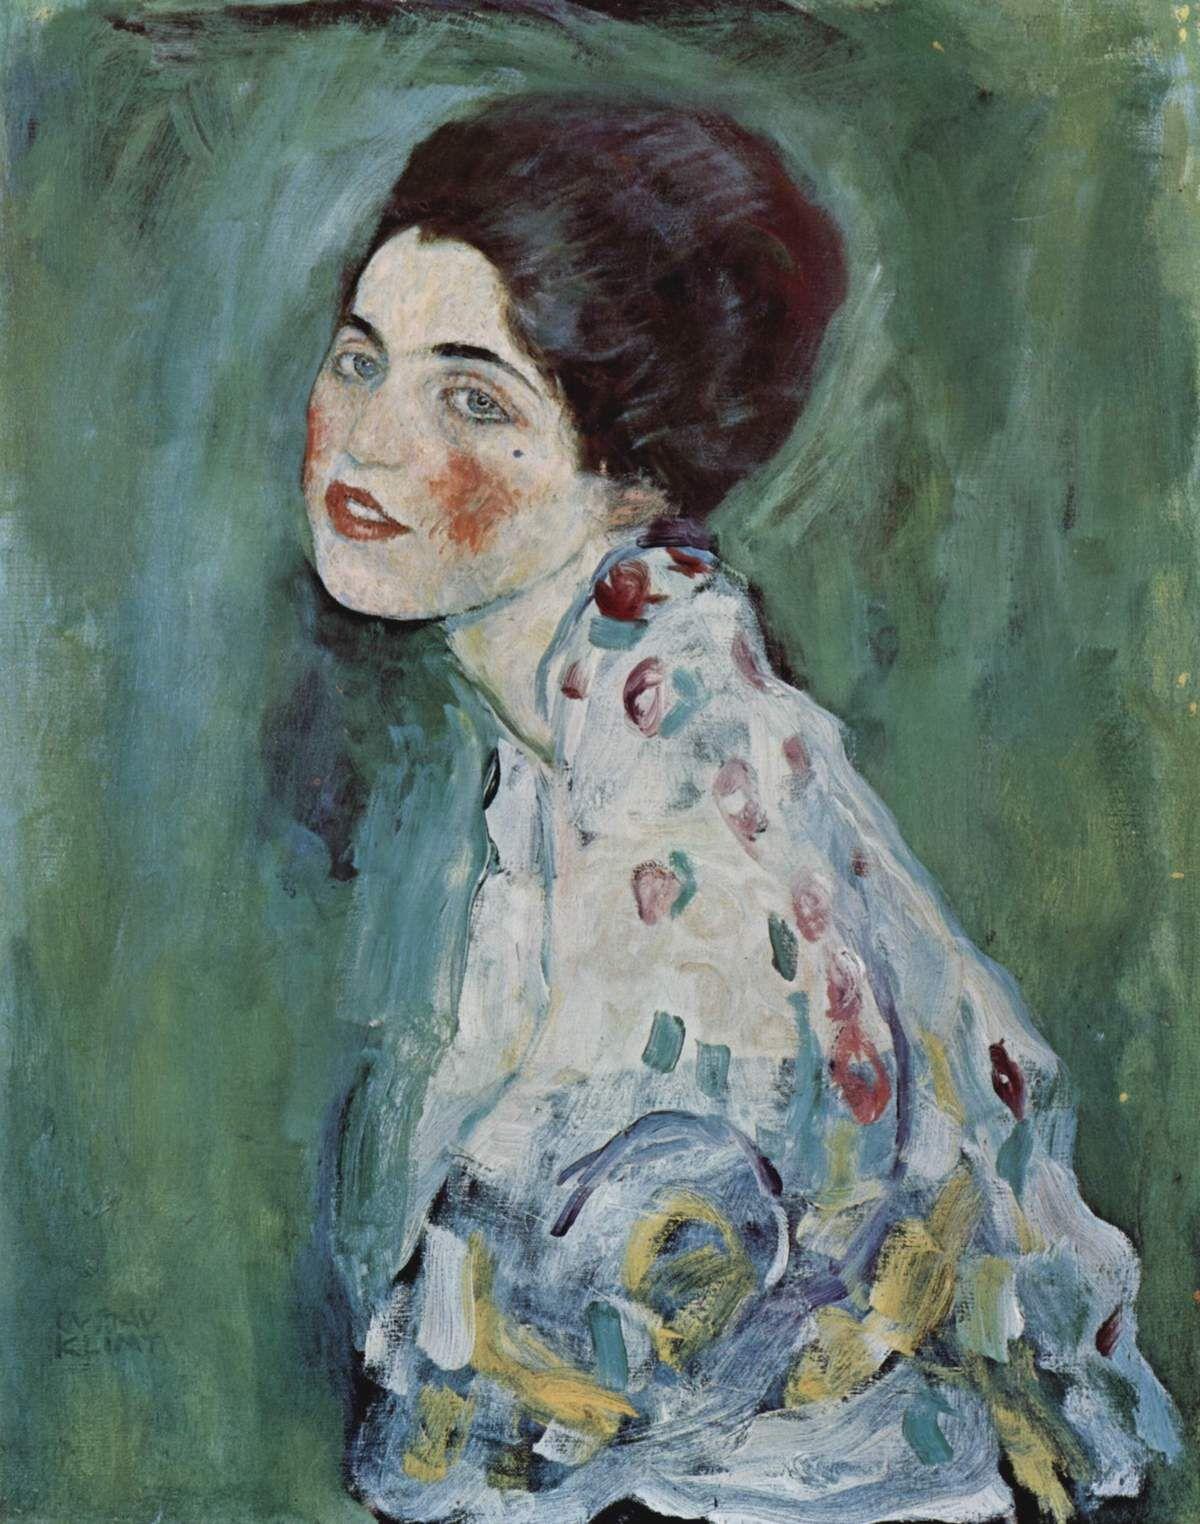 Gustave Klimt, Portrait of a Lady, 1917. Via Wikimedia Commons.